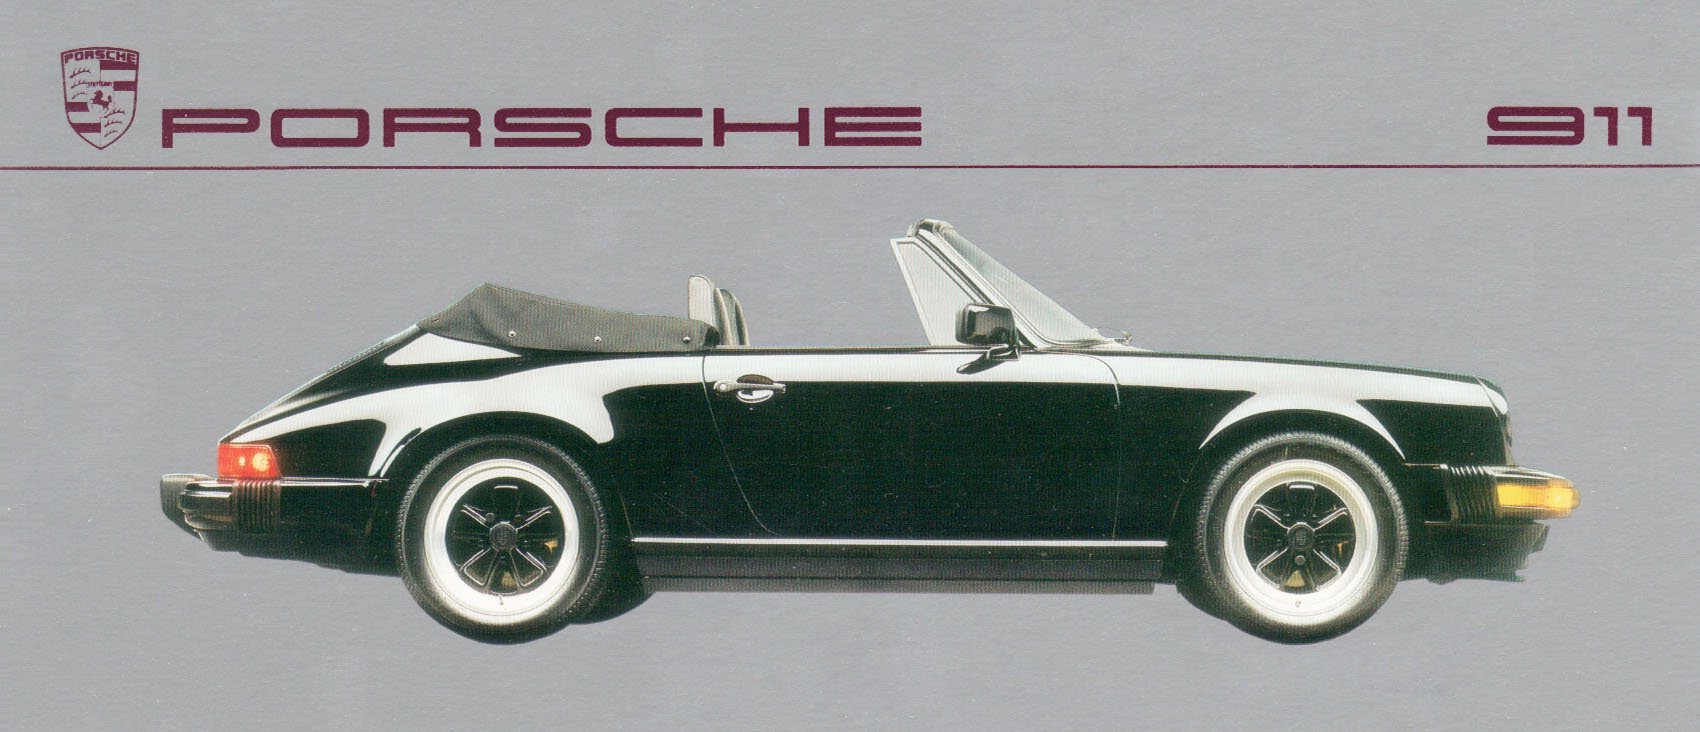 Flyer Porsche 911 from 1987